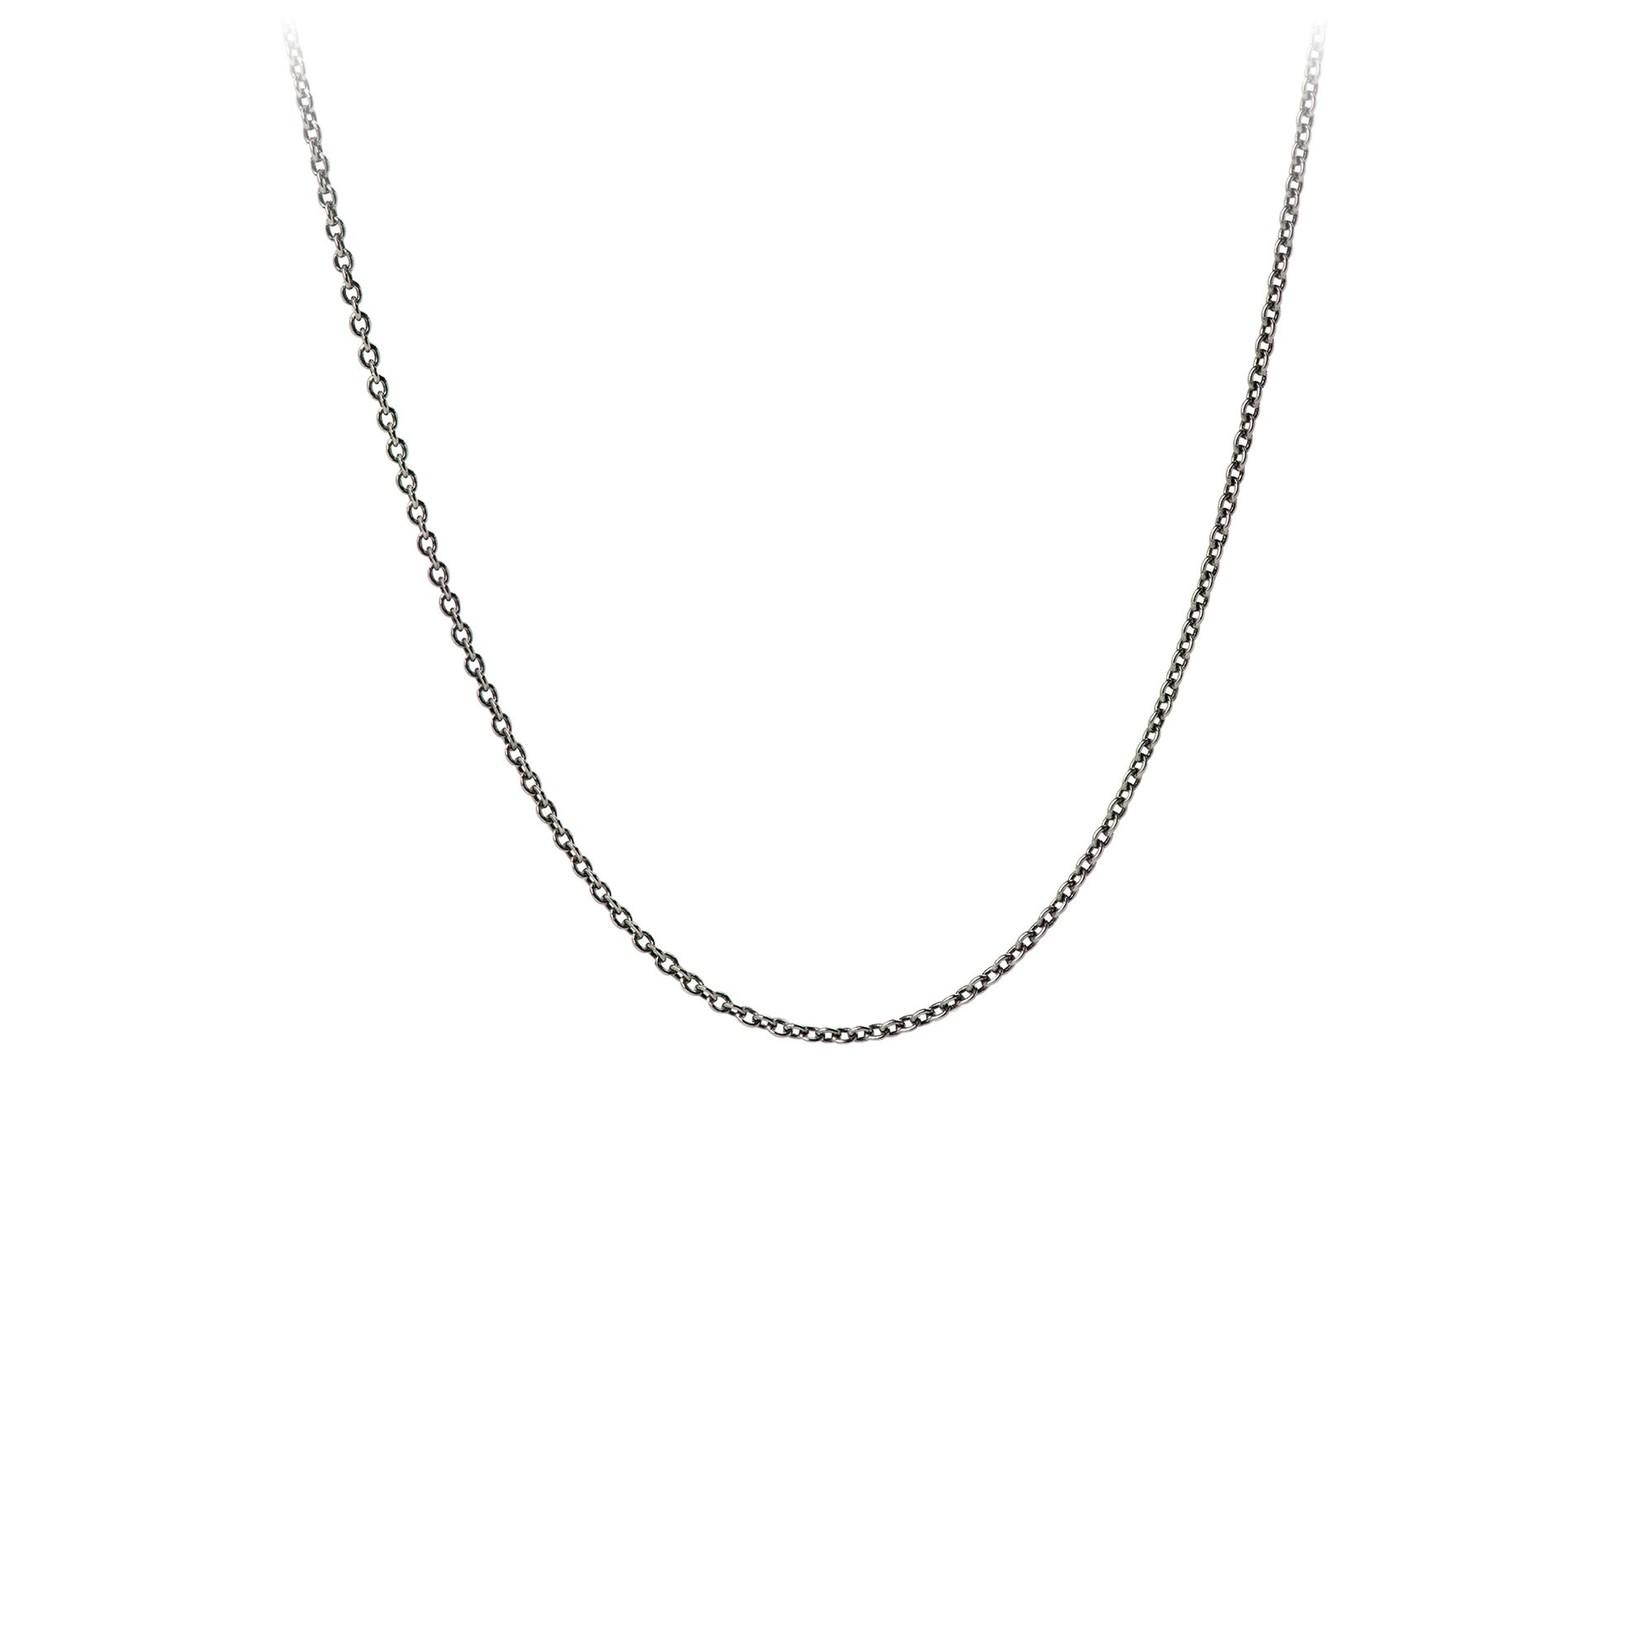 Pyrrha Oxidized Sterling Silver Fine Cable Chain